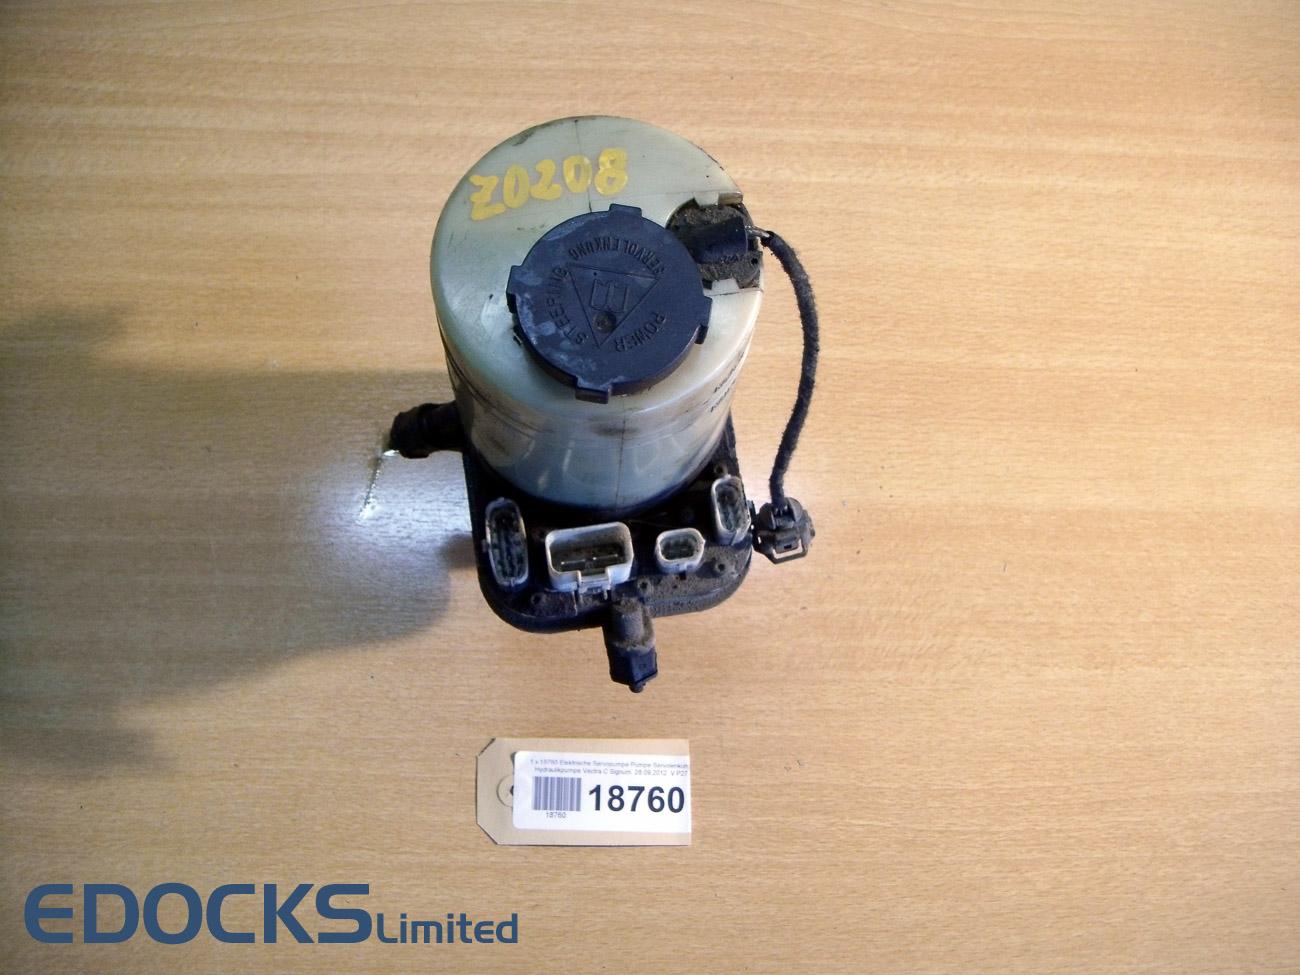 elektrische servopumpe pumpe servolenkung mit sensor vectra c signum opel. Black Bedroom Furniture Sets. Home Design Ideas